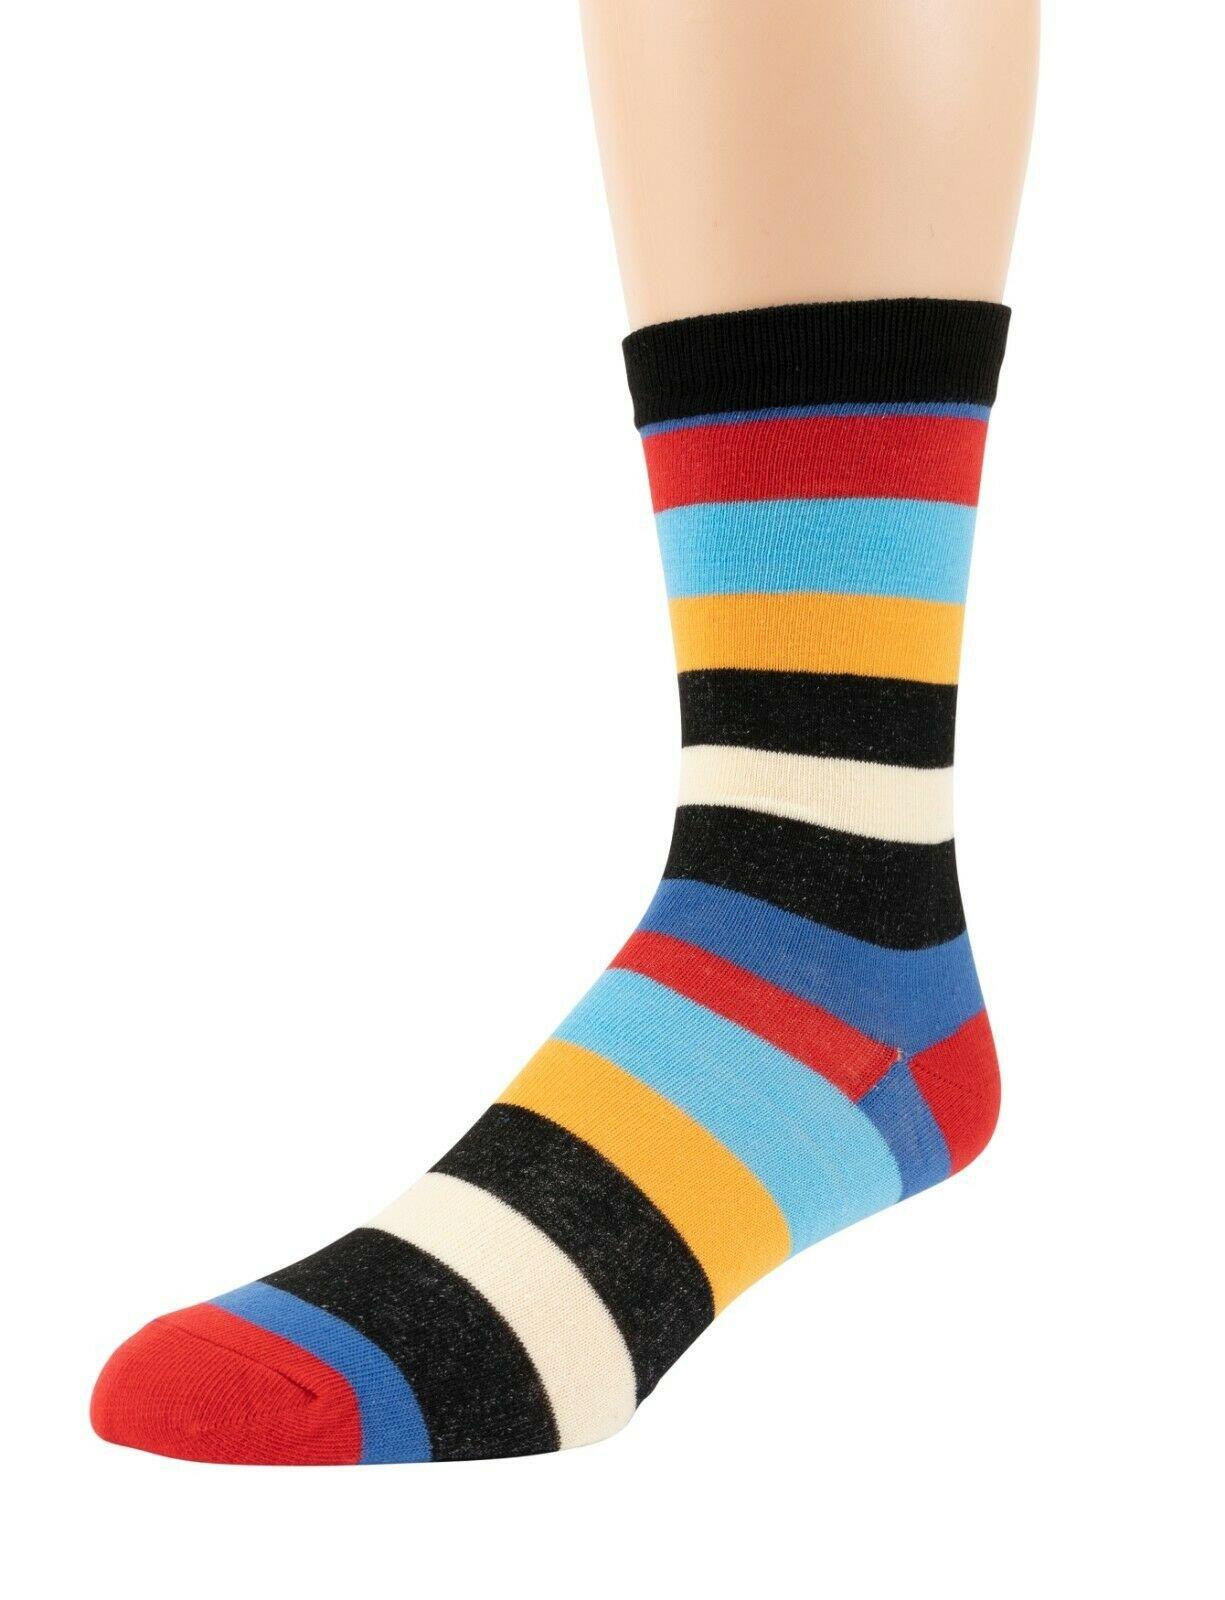 Mitch-Bogen-Mens-Cotton-Dress-Socks-Colorful-Fashion-Crew-Socks-8-Pack-Gift-Box thumbnail 60